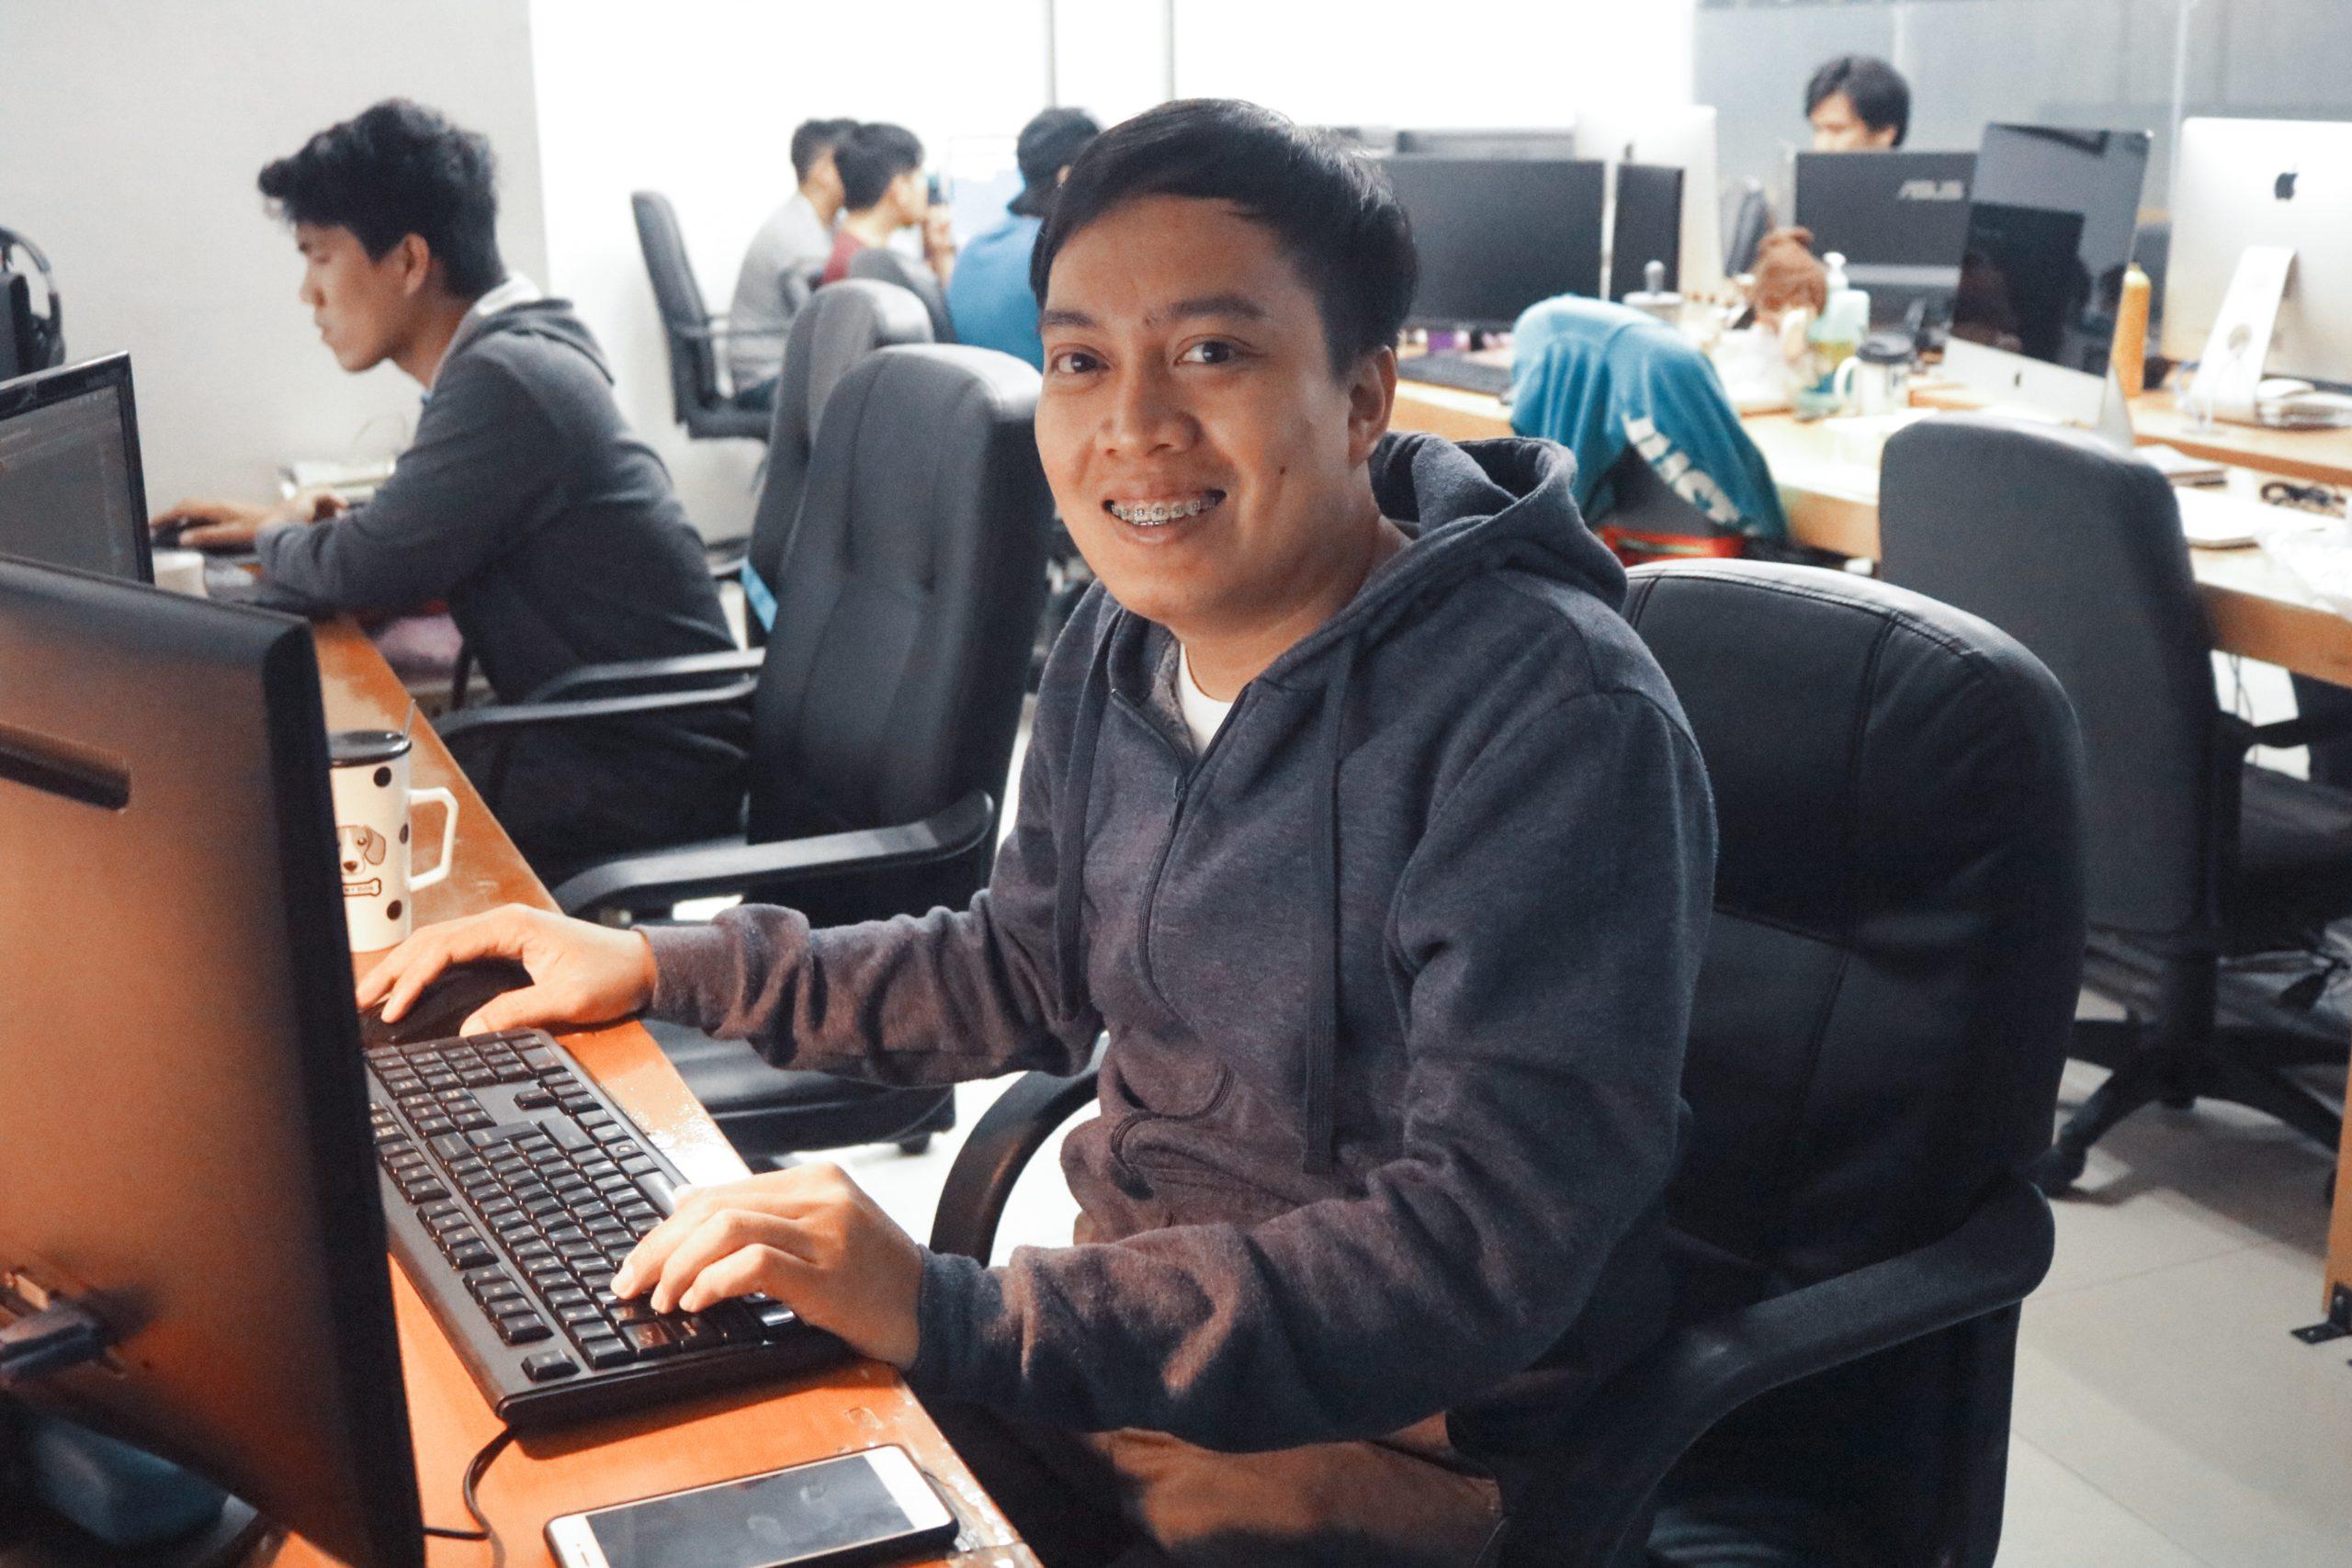 Philippine virtual assistants